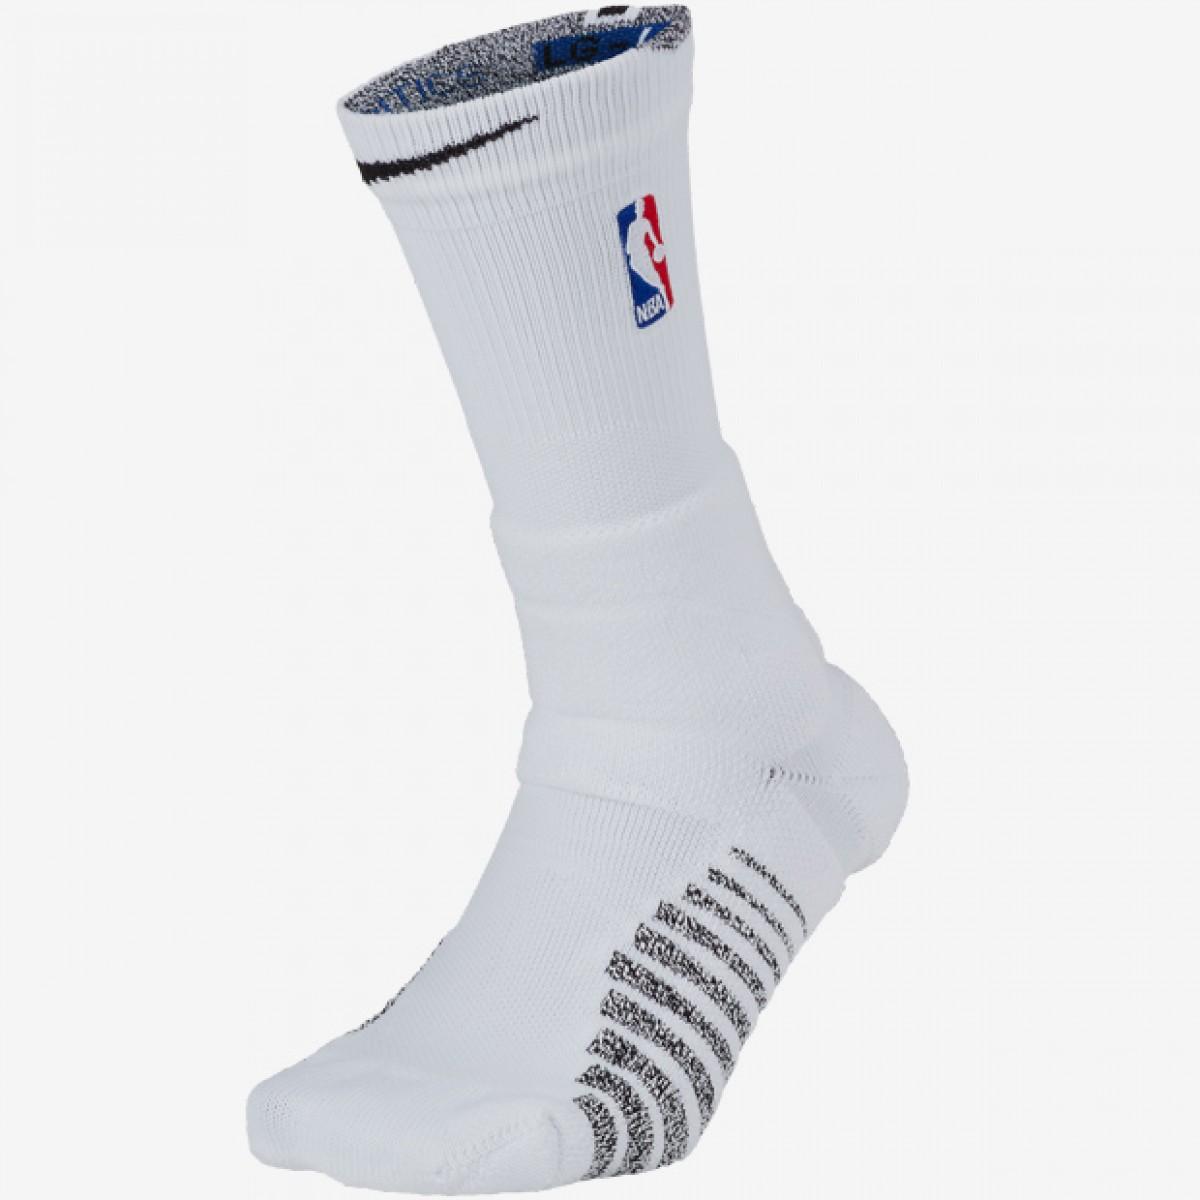 Calcetín Nike Grip Power Crew NBA 'White'